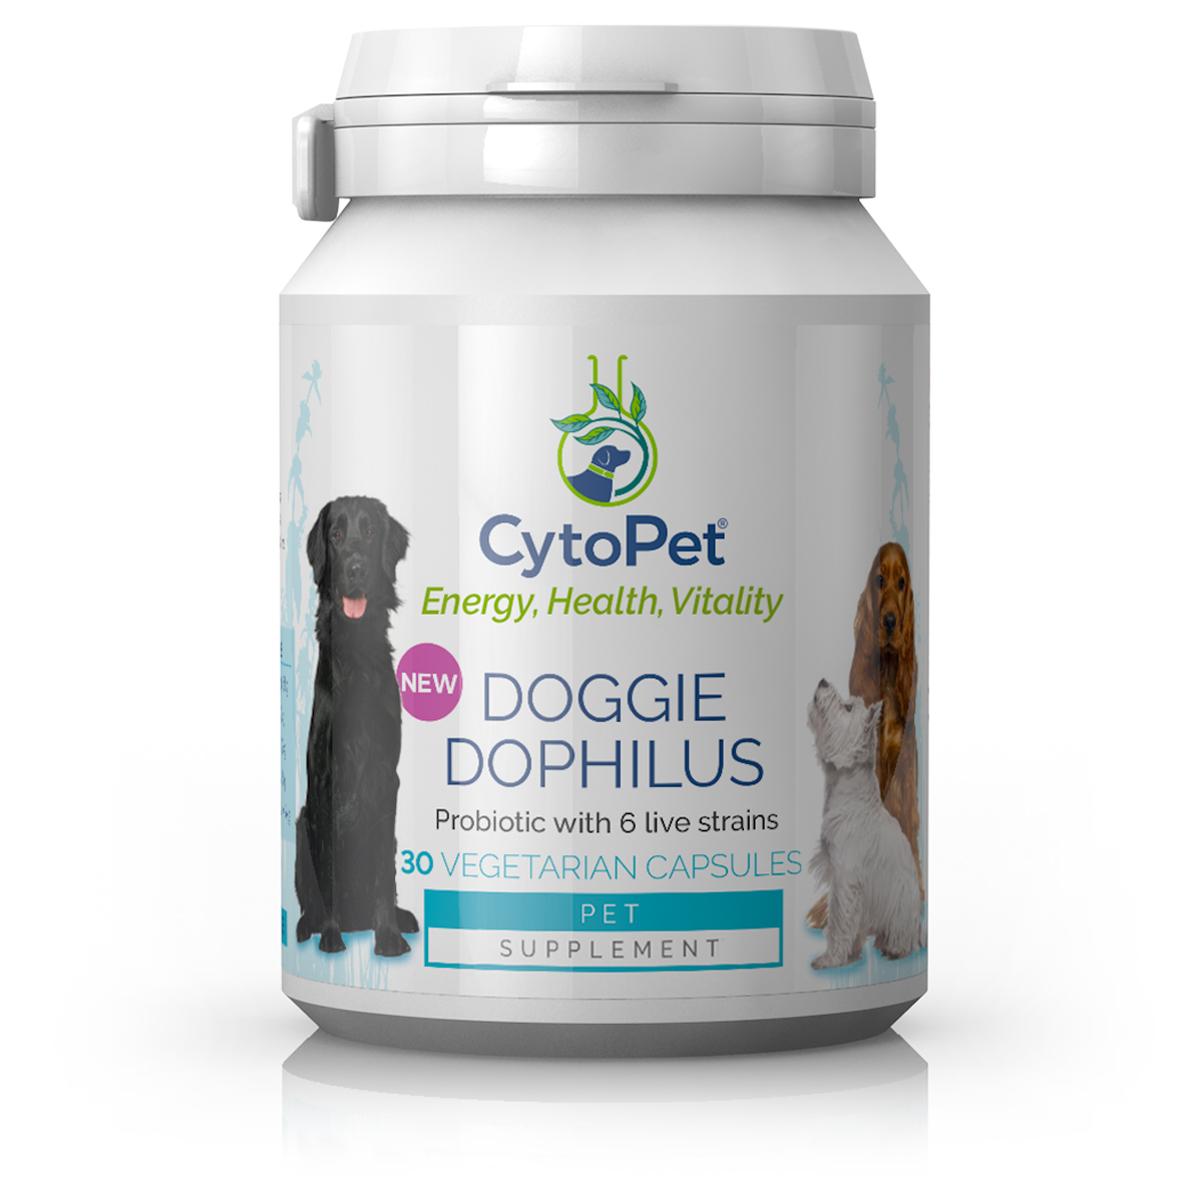 CytoPet Doggie Dophilus 30's